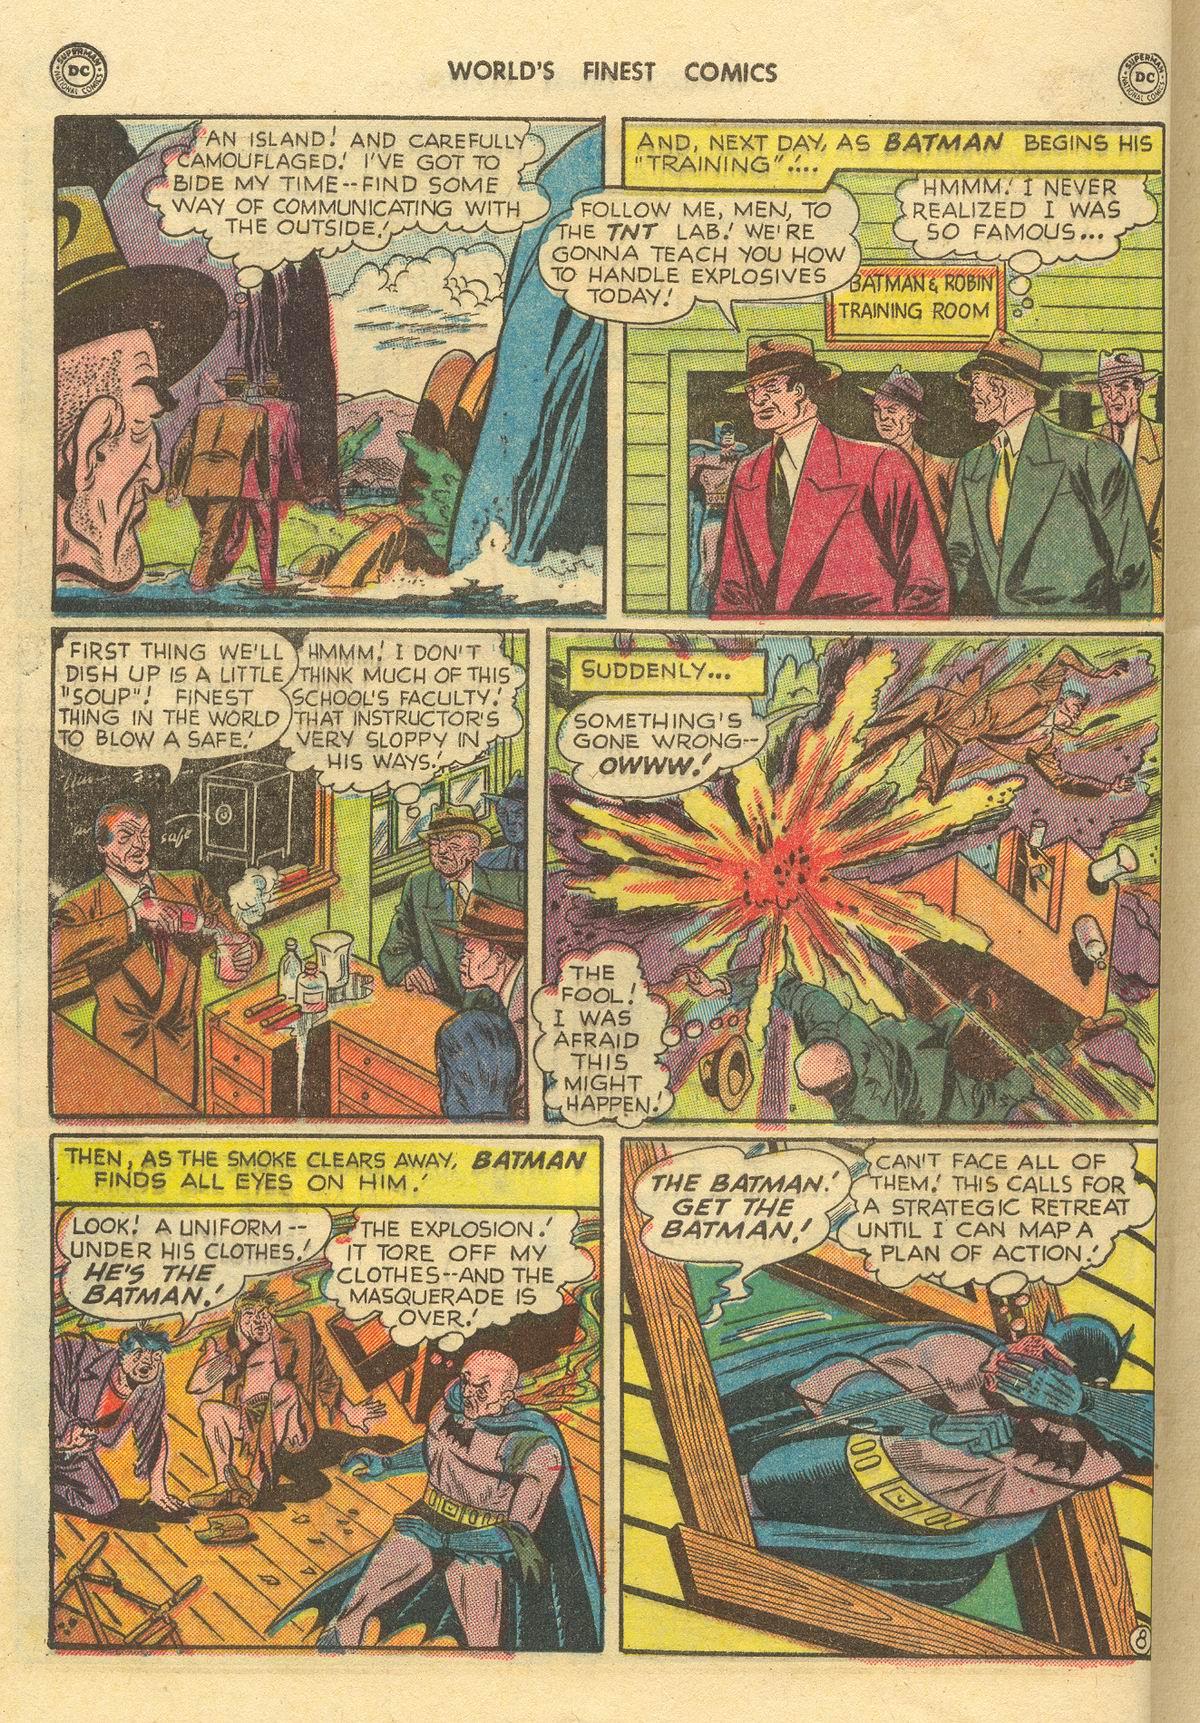 Read online World's Finest Comics comic -  Issue #51 - 70